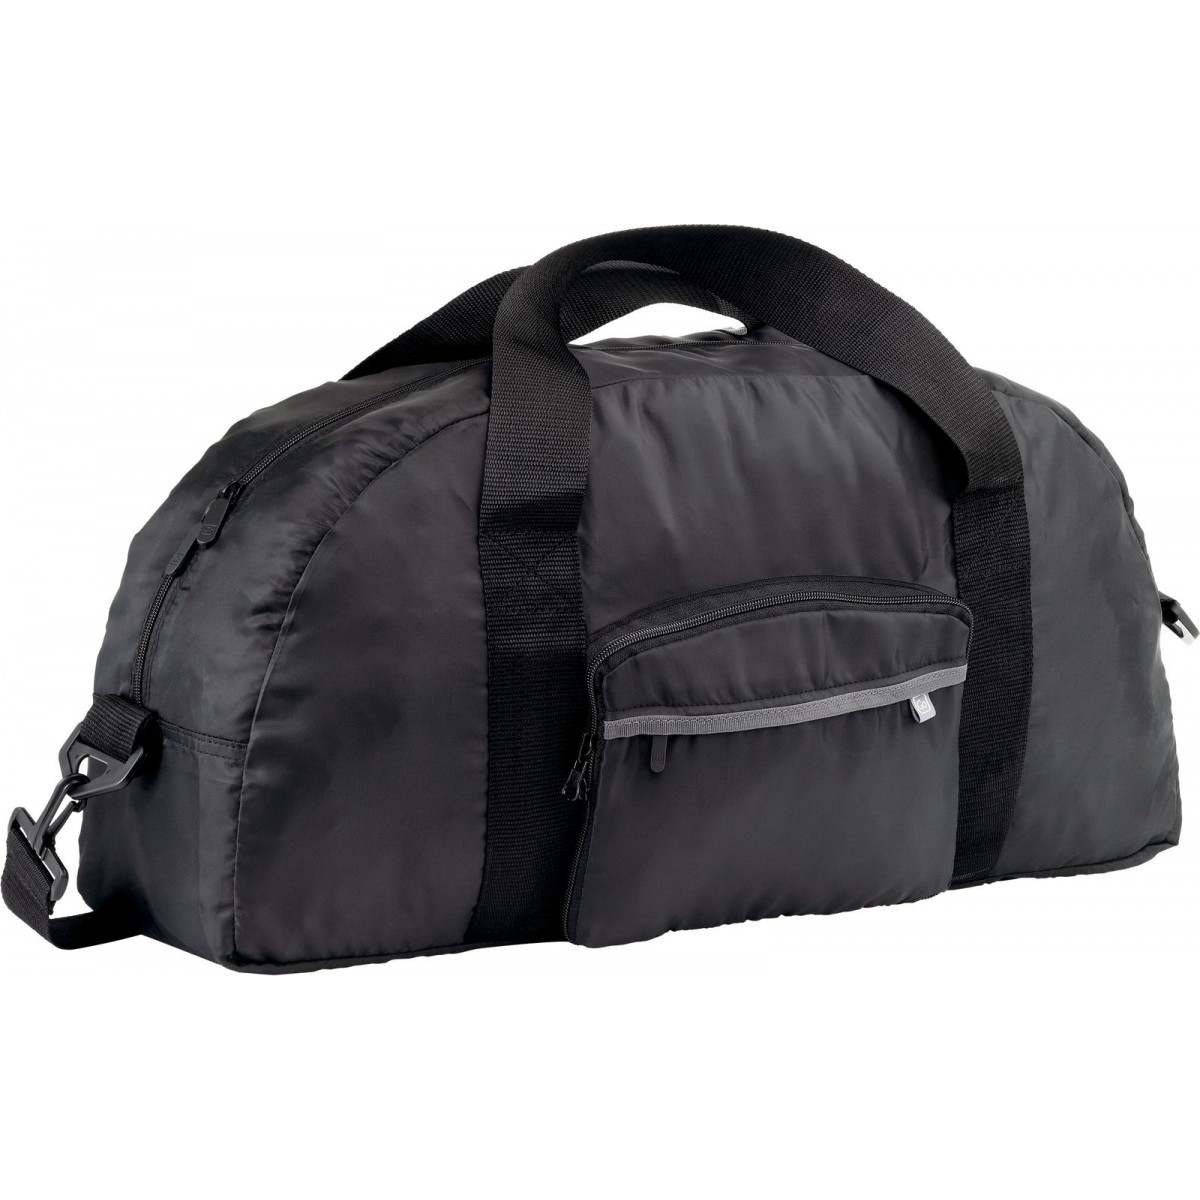 travel bags travel bag (light) oywtrez